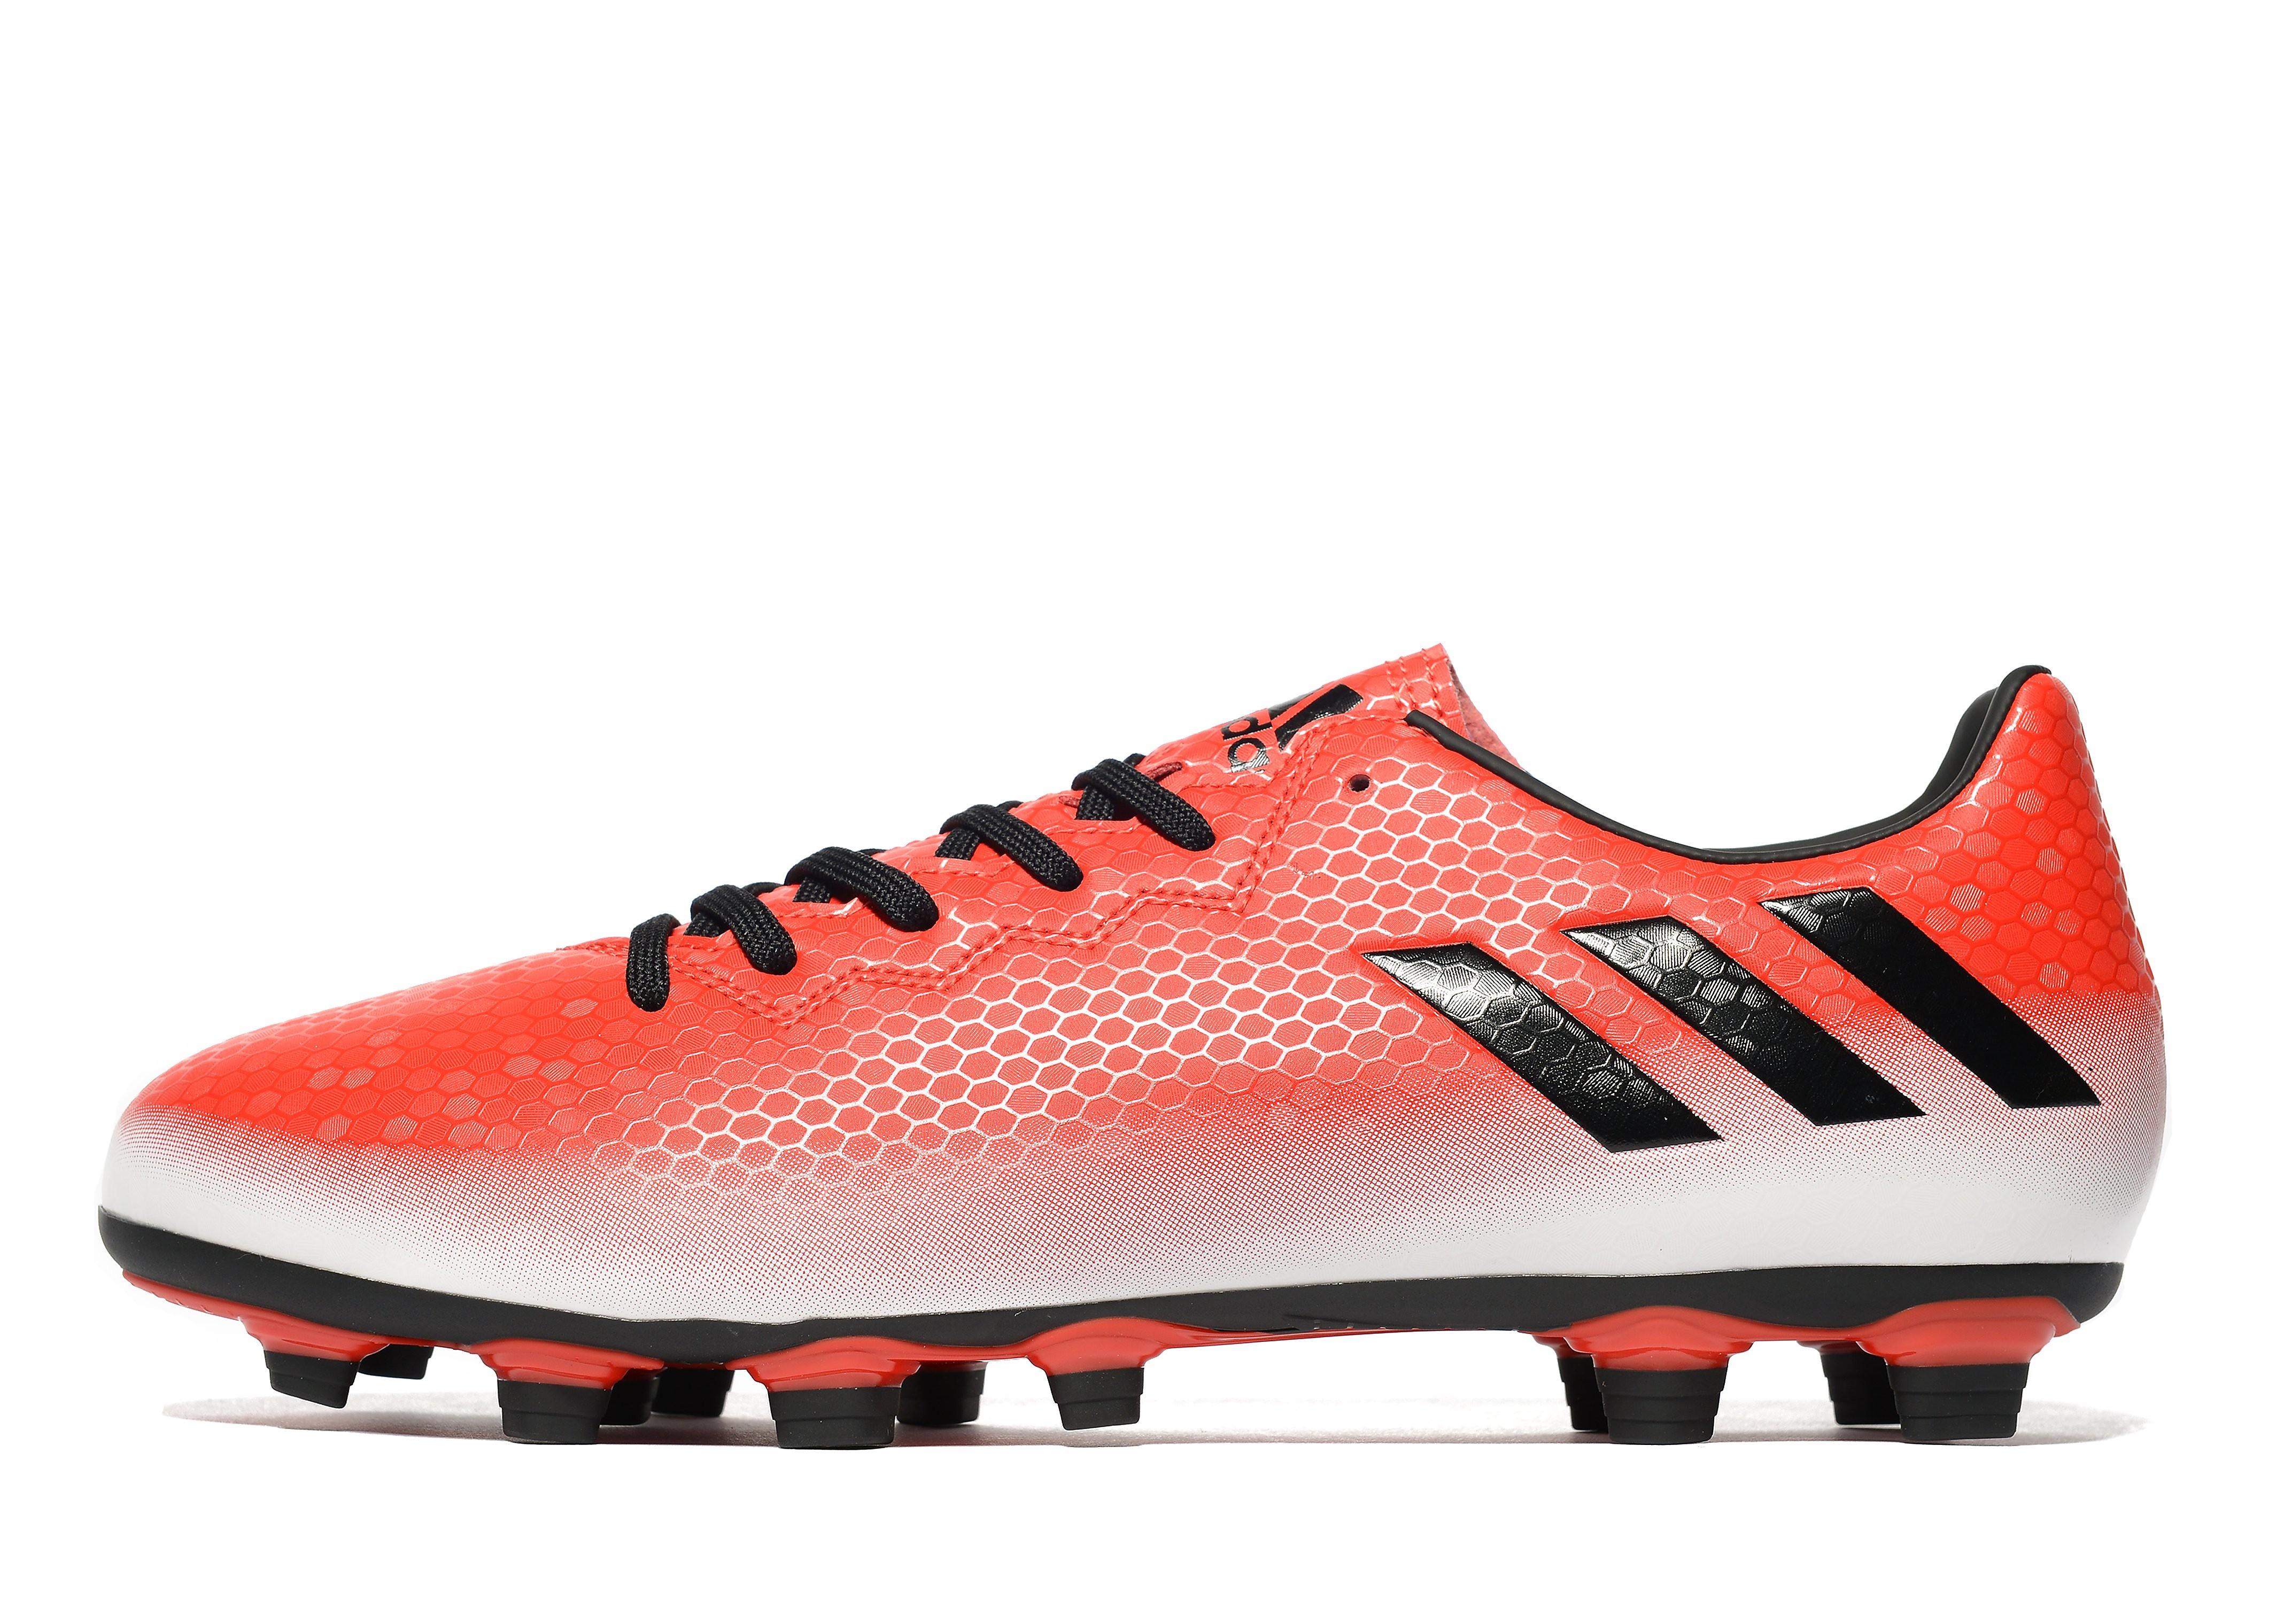 adidas Red Limit Messi 16.4 FXG